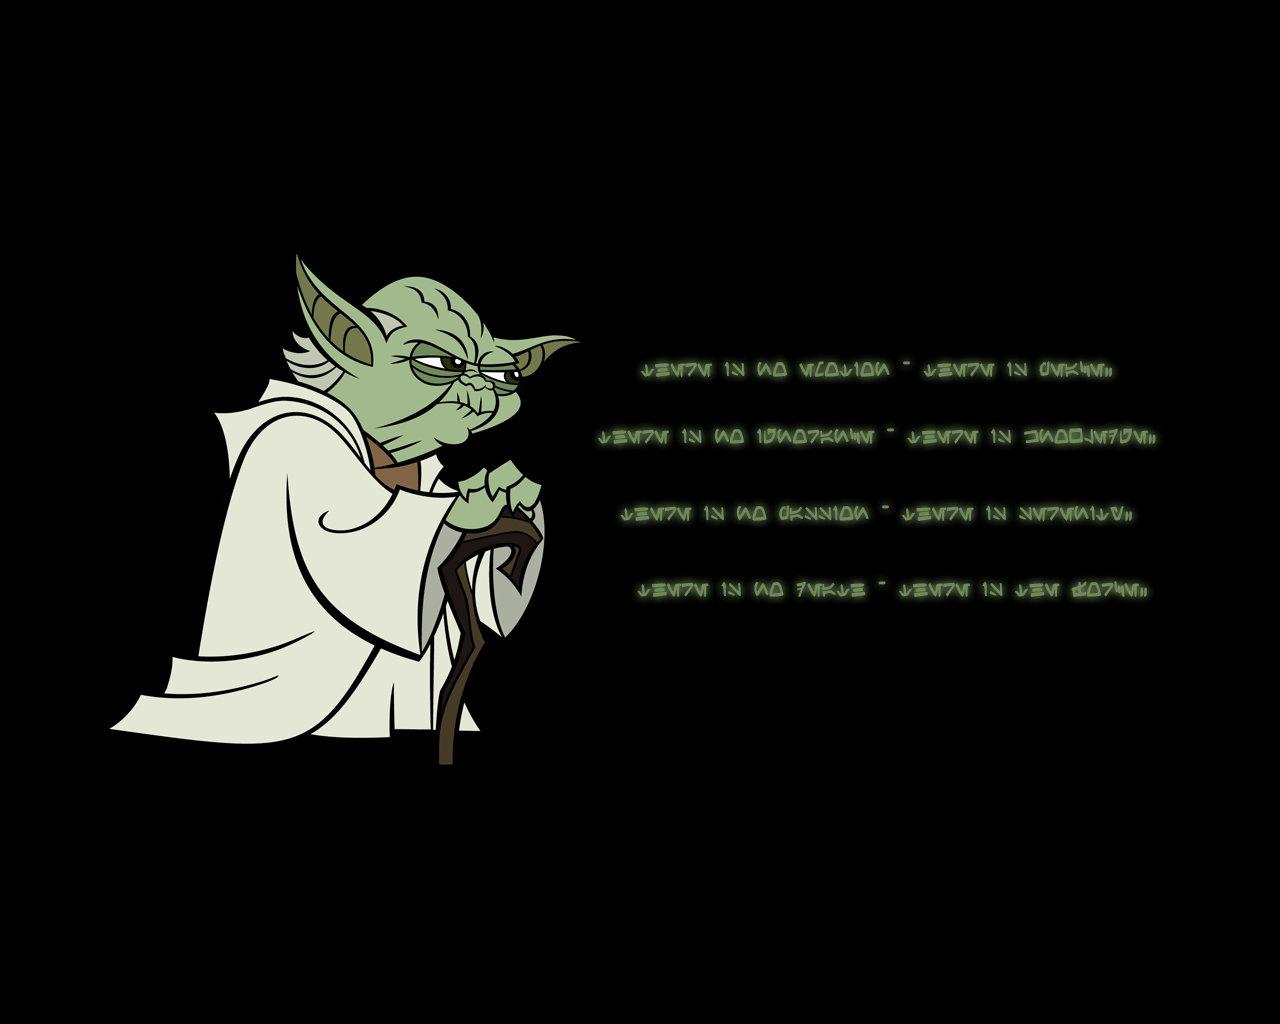 Jedi Code Sith Code http9mmbmfdeviantartcomartJedi Code 1280x1024